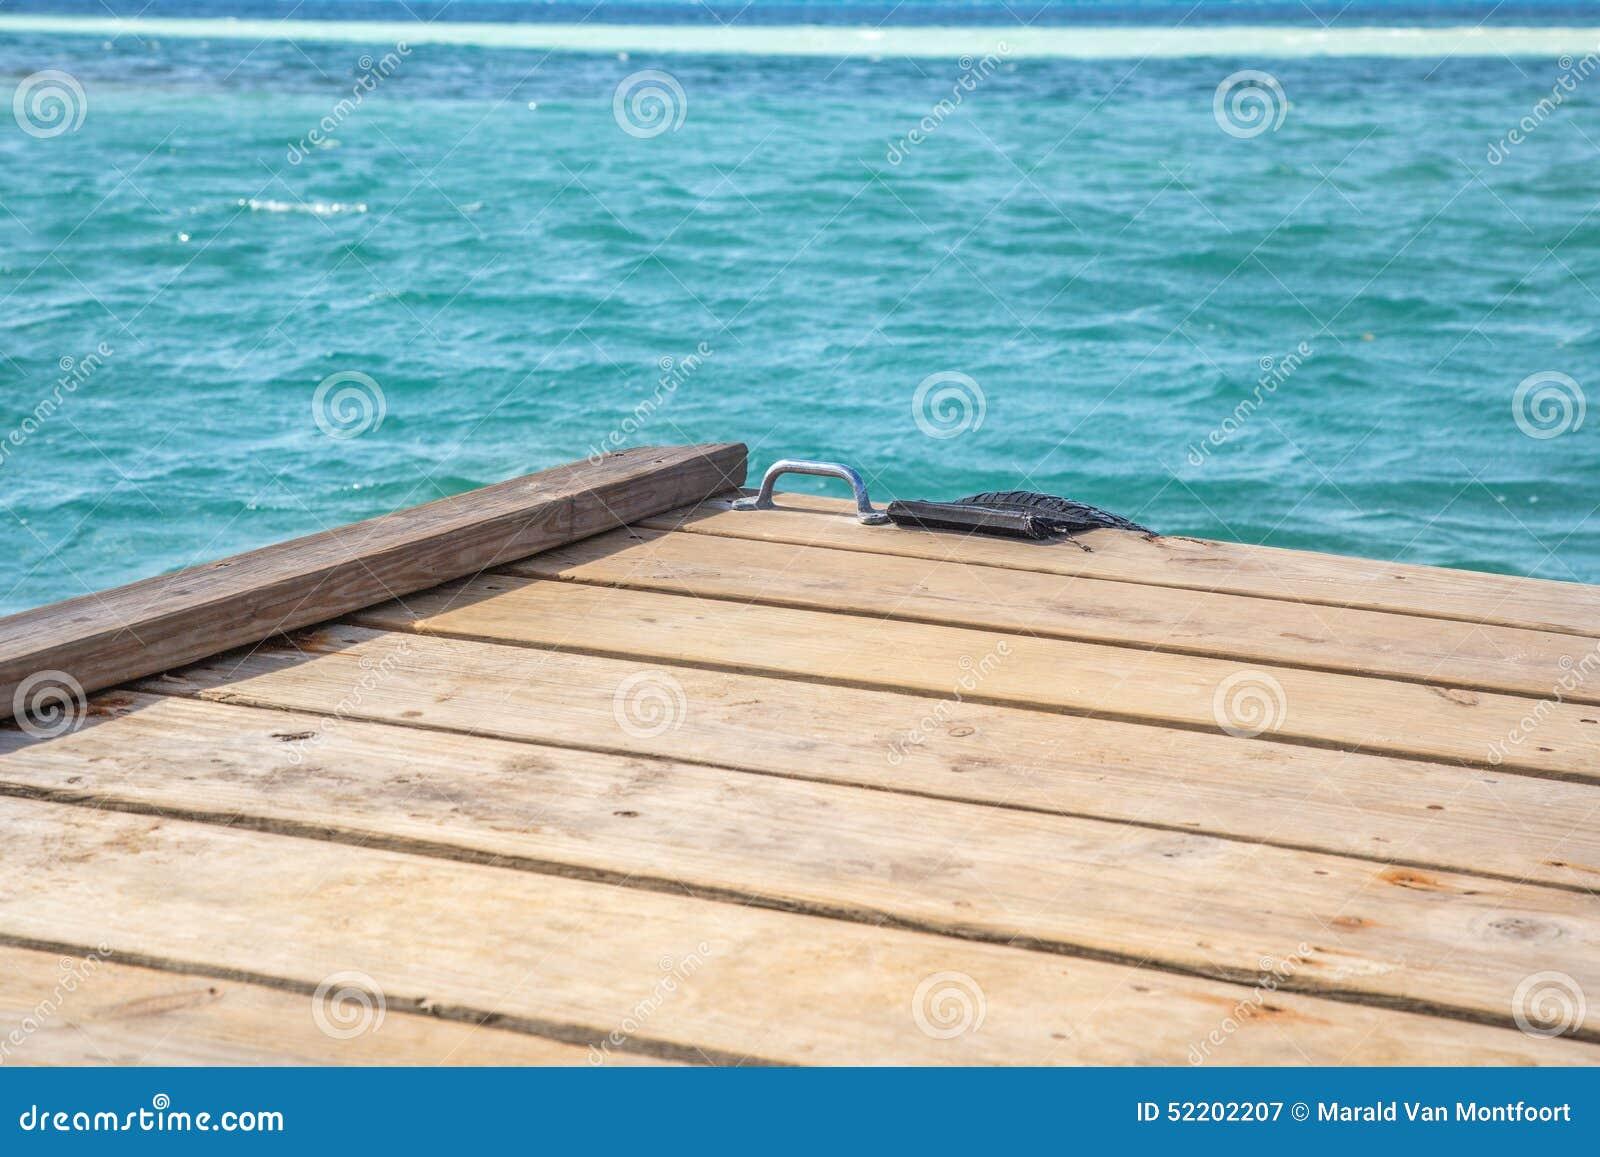 Caribbean Peer Stock Photo - Image: 52202207